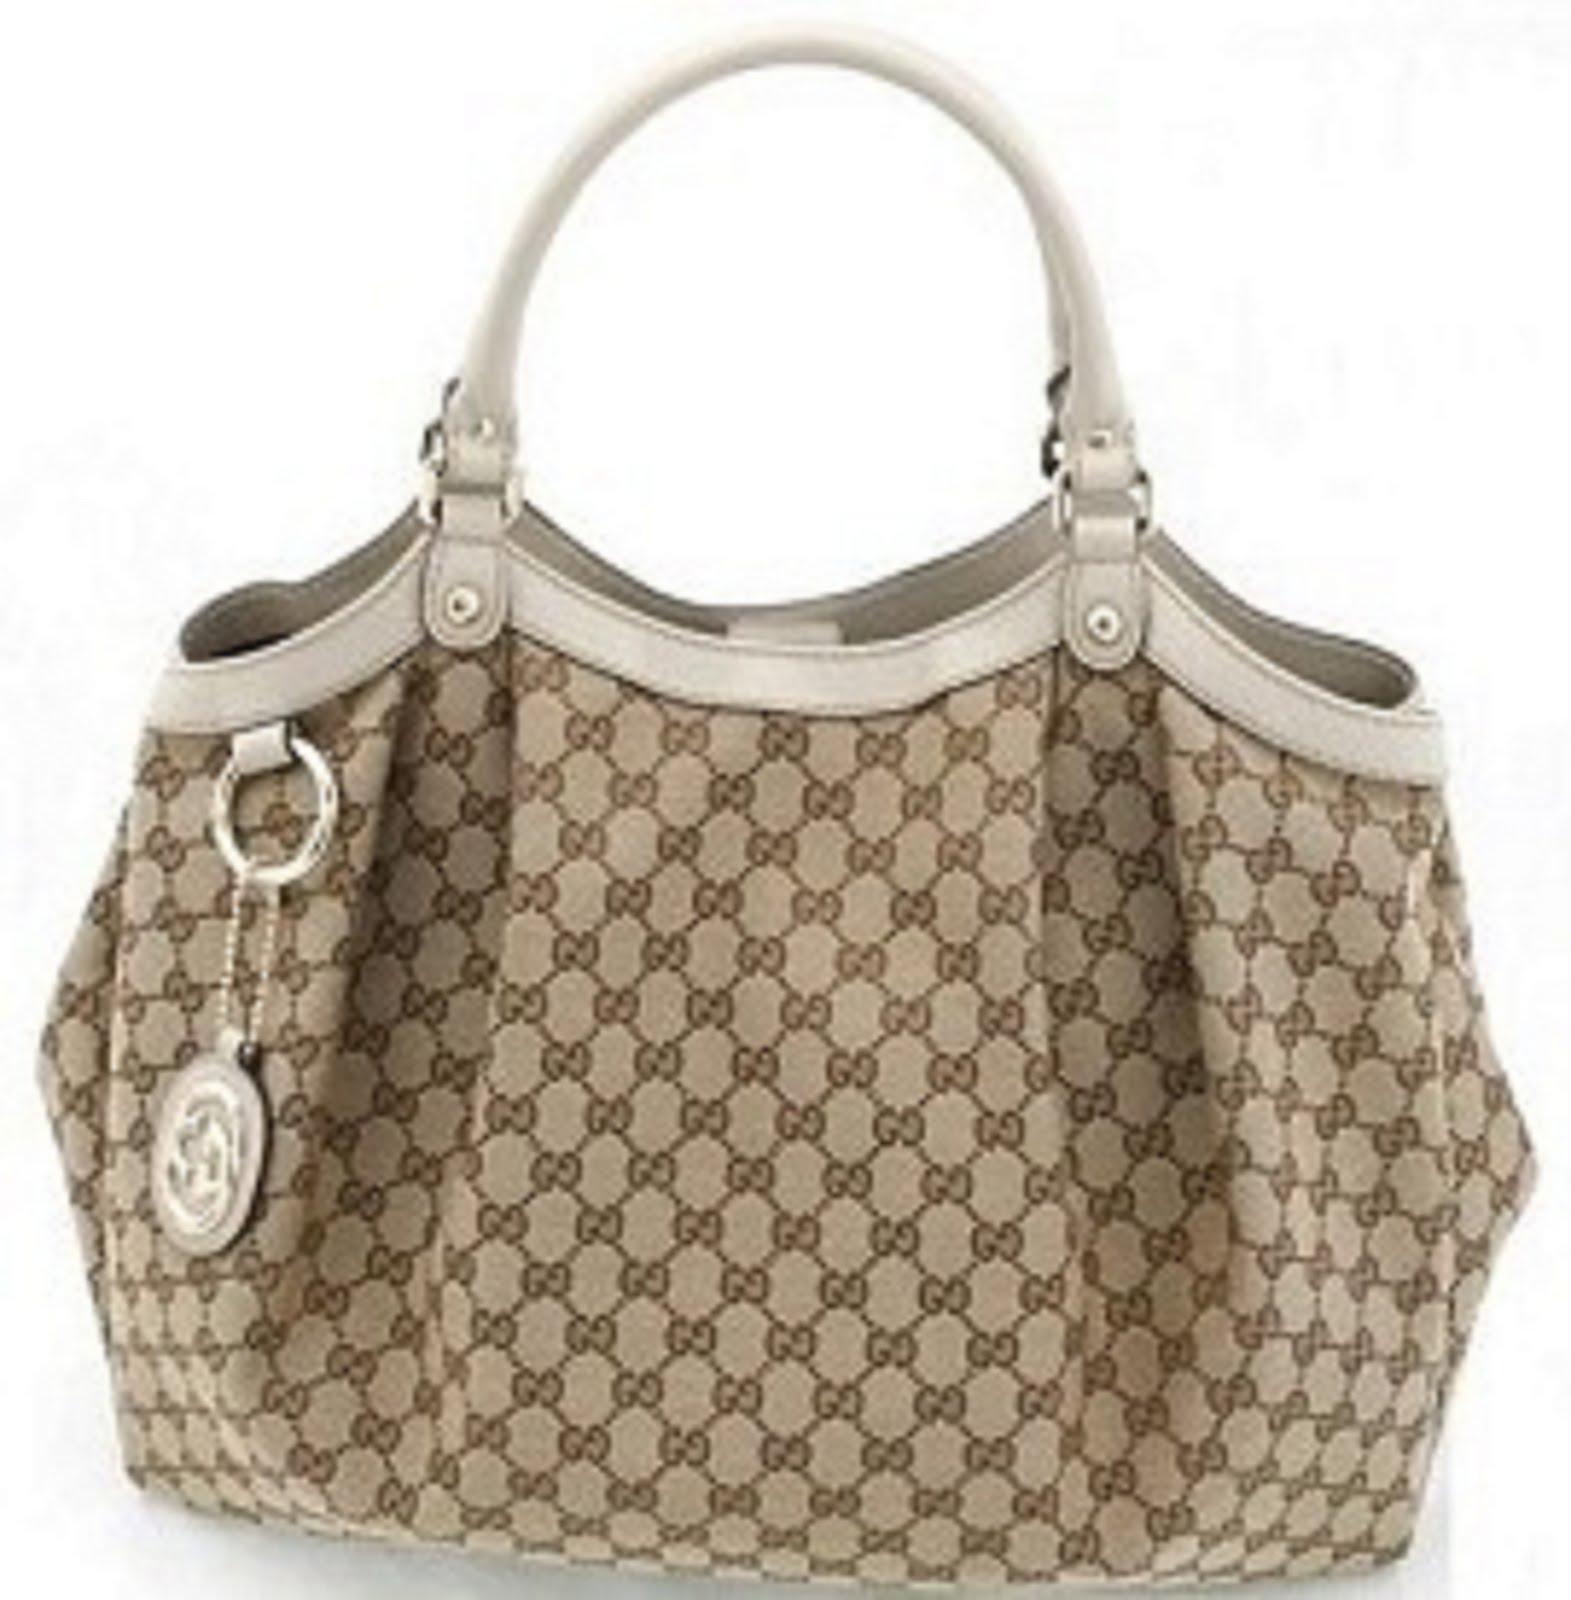 Gucci Sukey Large Tote Bag Beige White